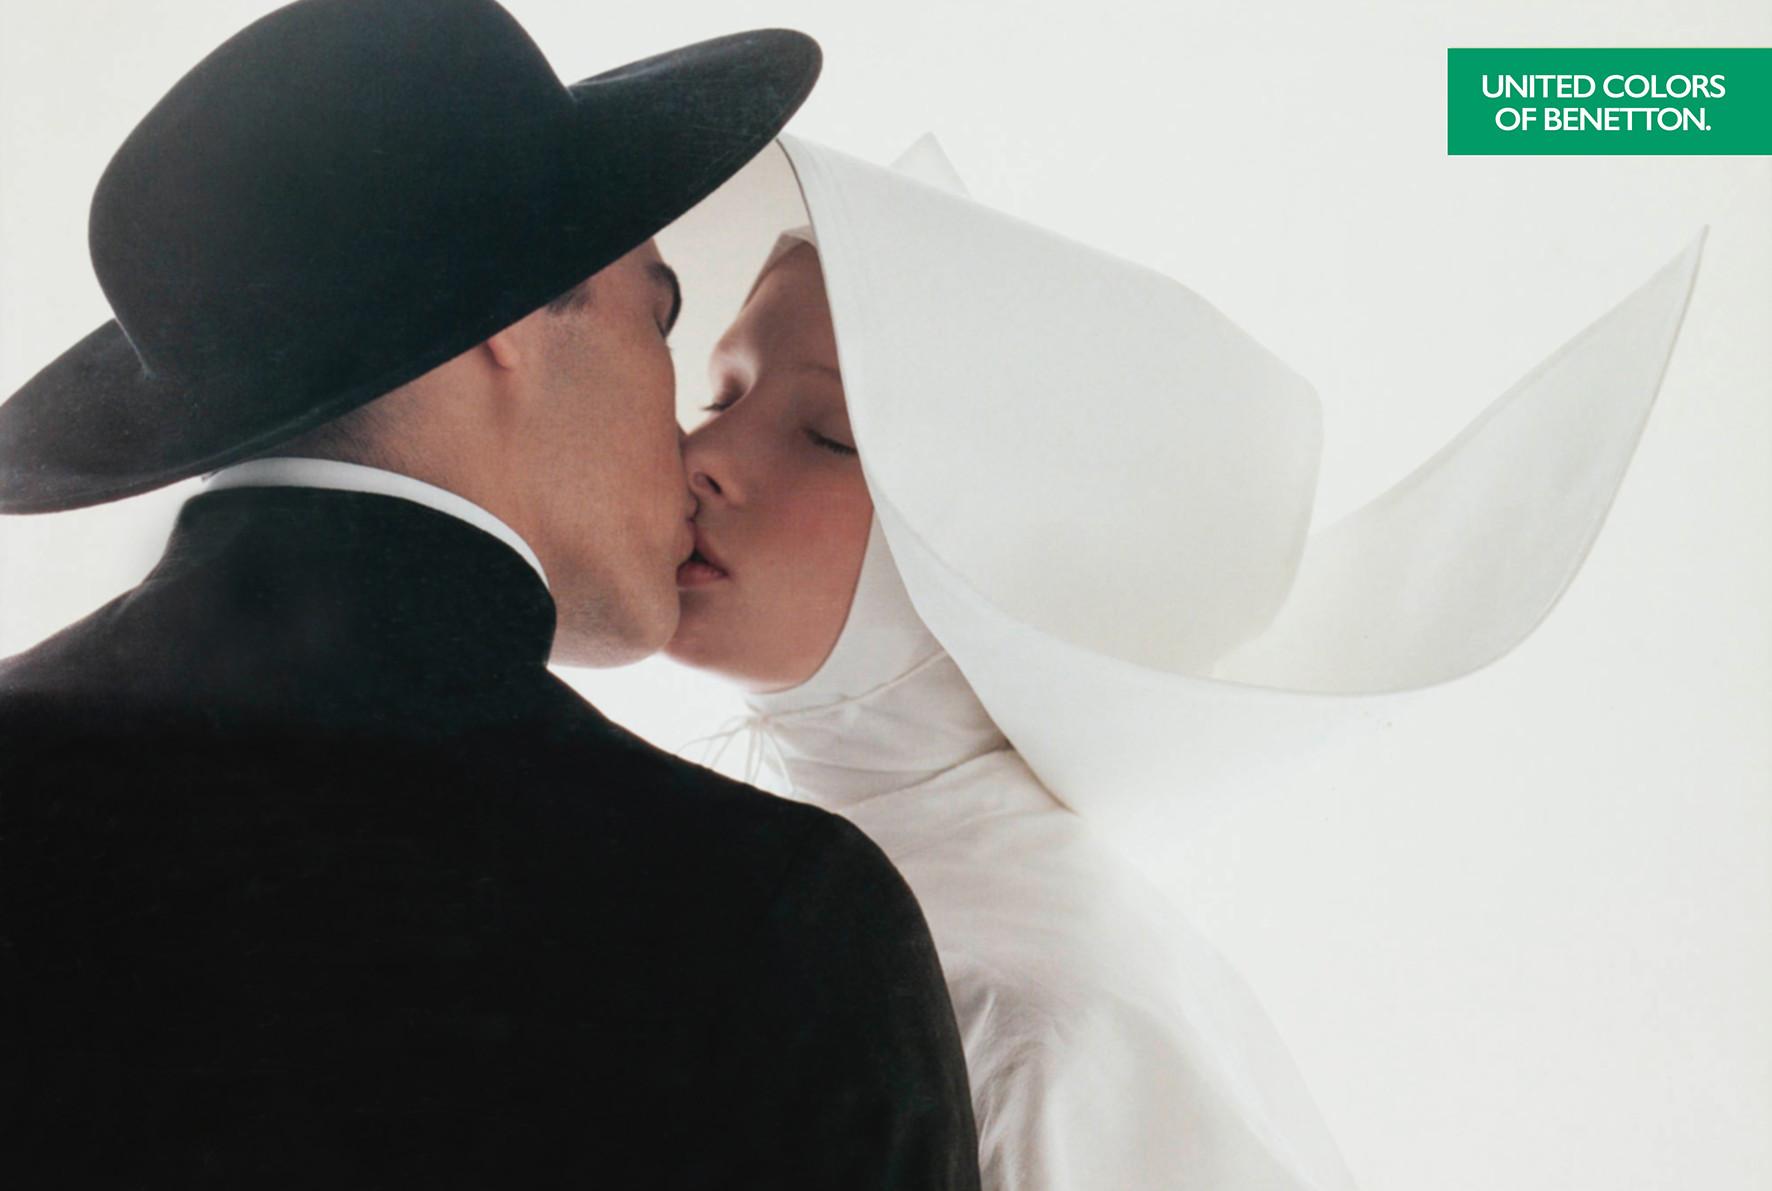 Benetton - Priester küsst Nonne (1992)